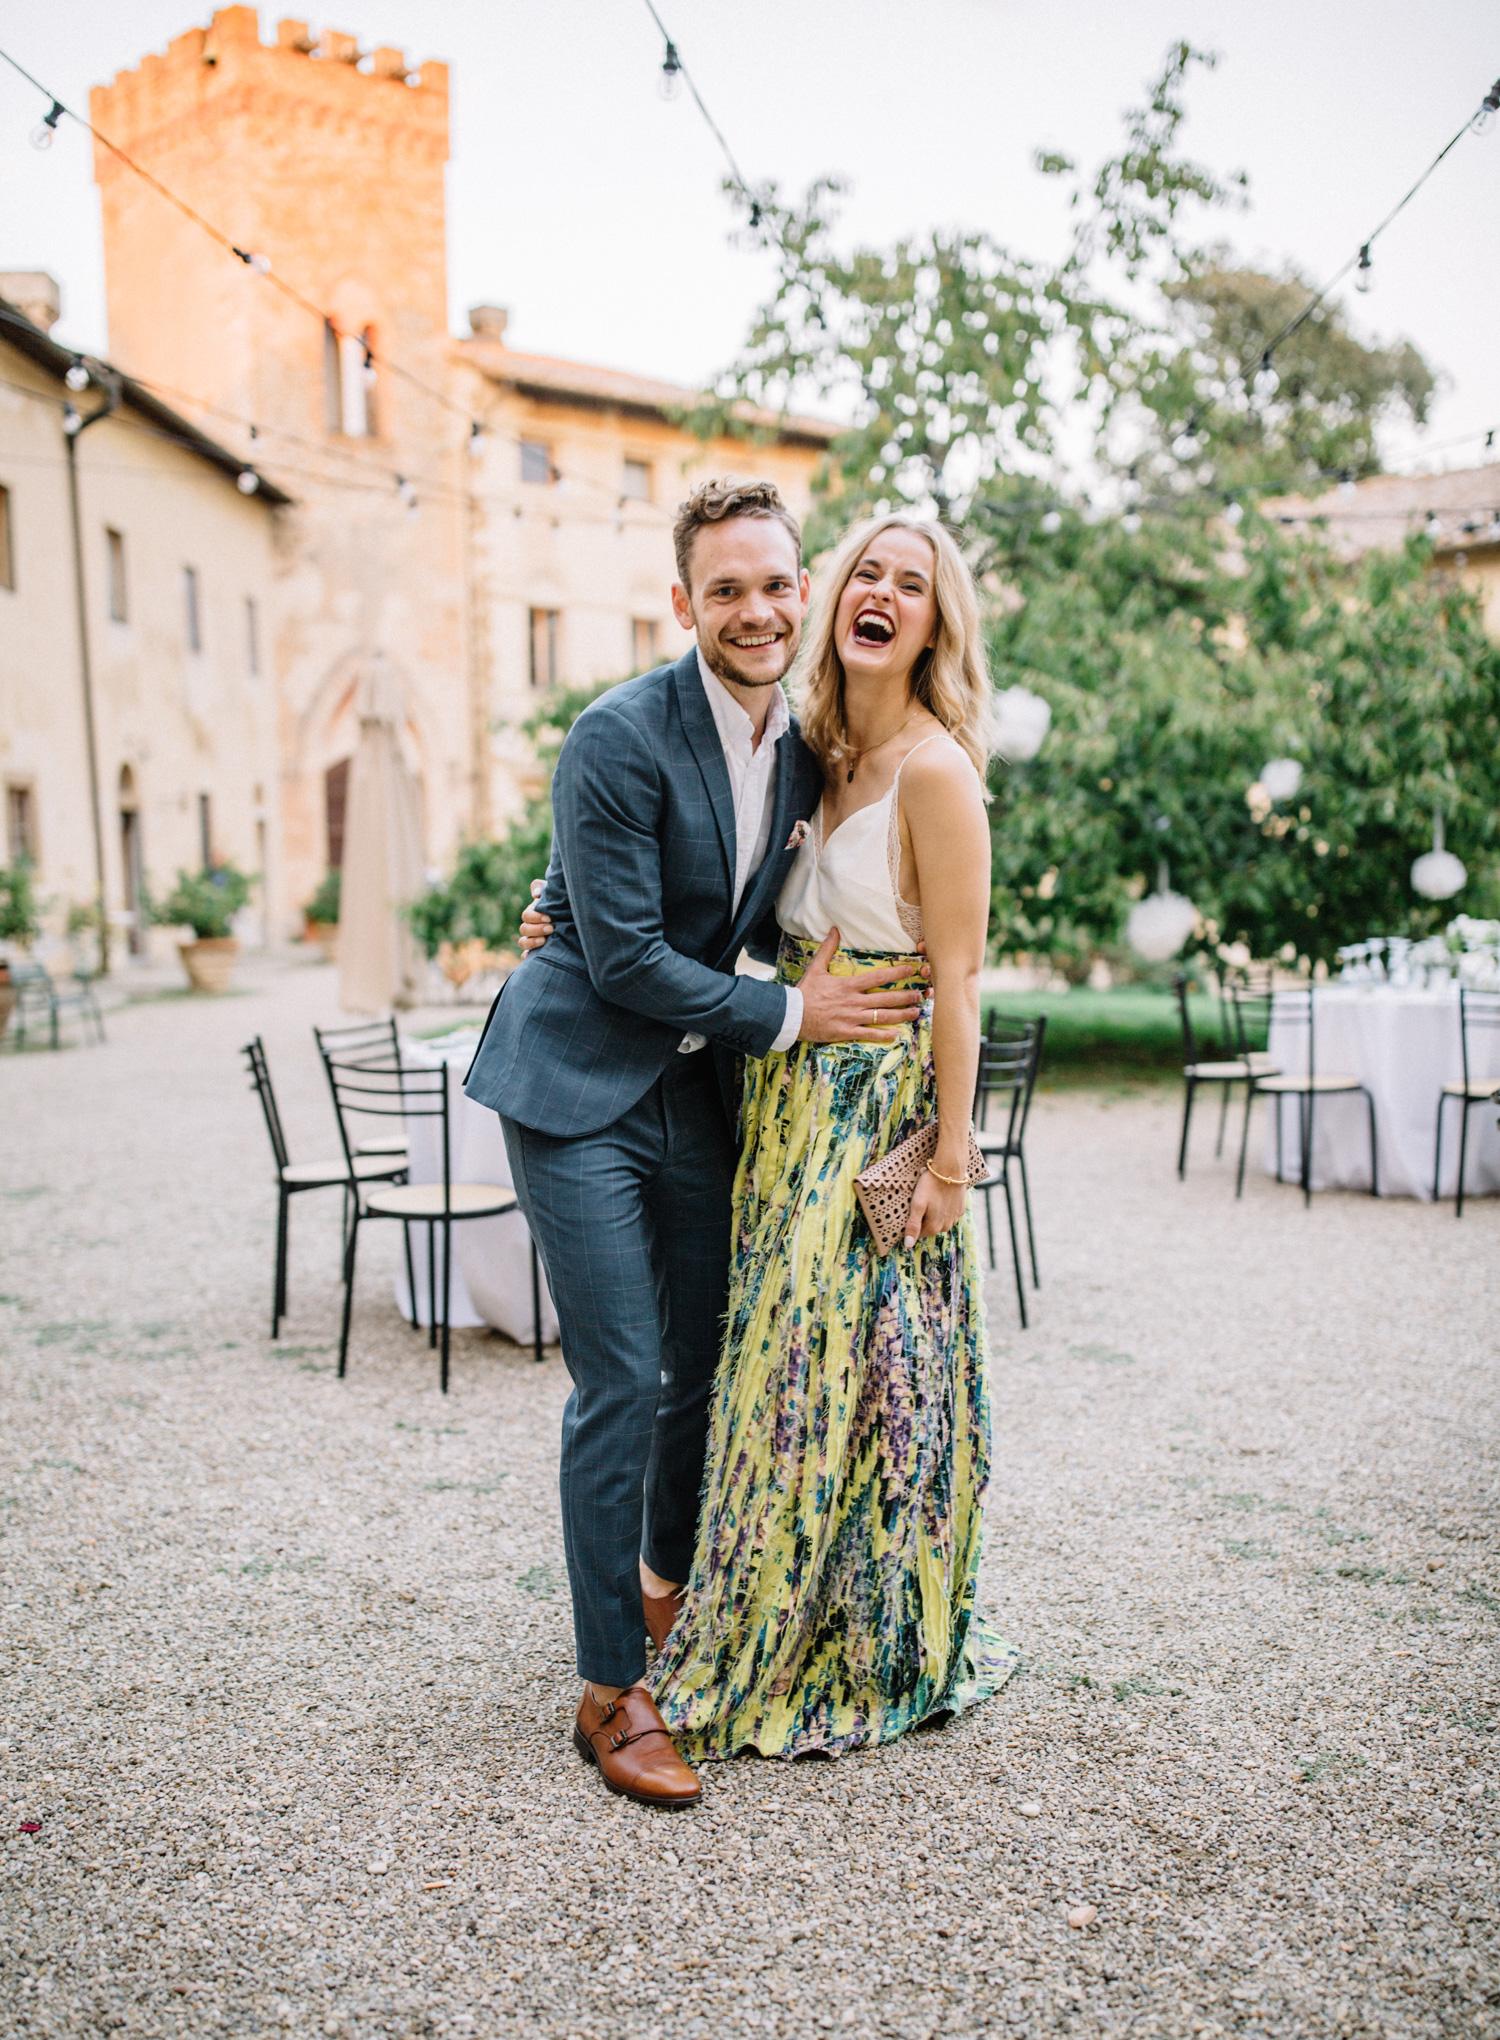 33704f7e bryllups-borde wedding-guest-dresses folie-ballon wedding-guests